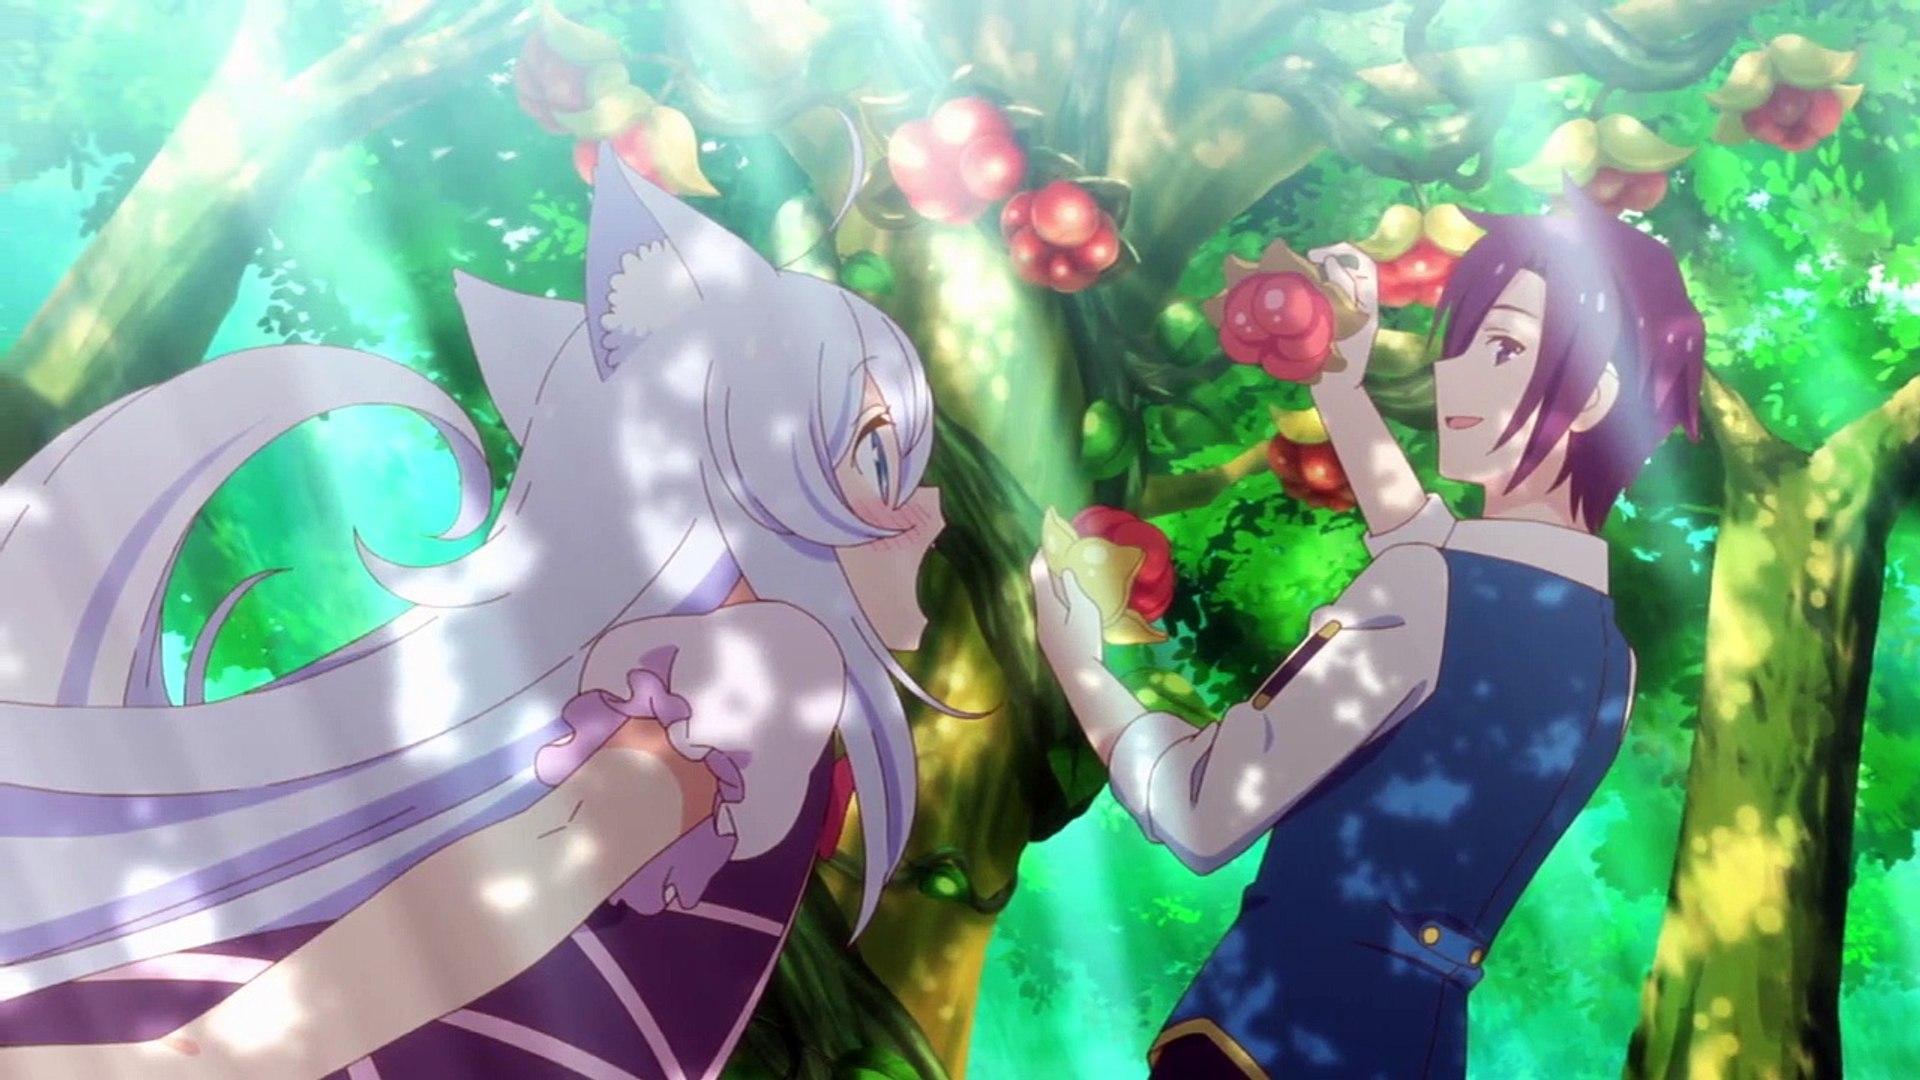 isekai drugstore reiji Cheat Kusushi no Slow Life: Isekai ni Tsukurou Drugstore noella picking apples